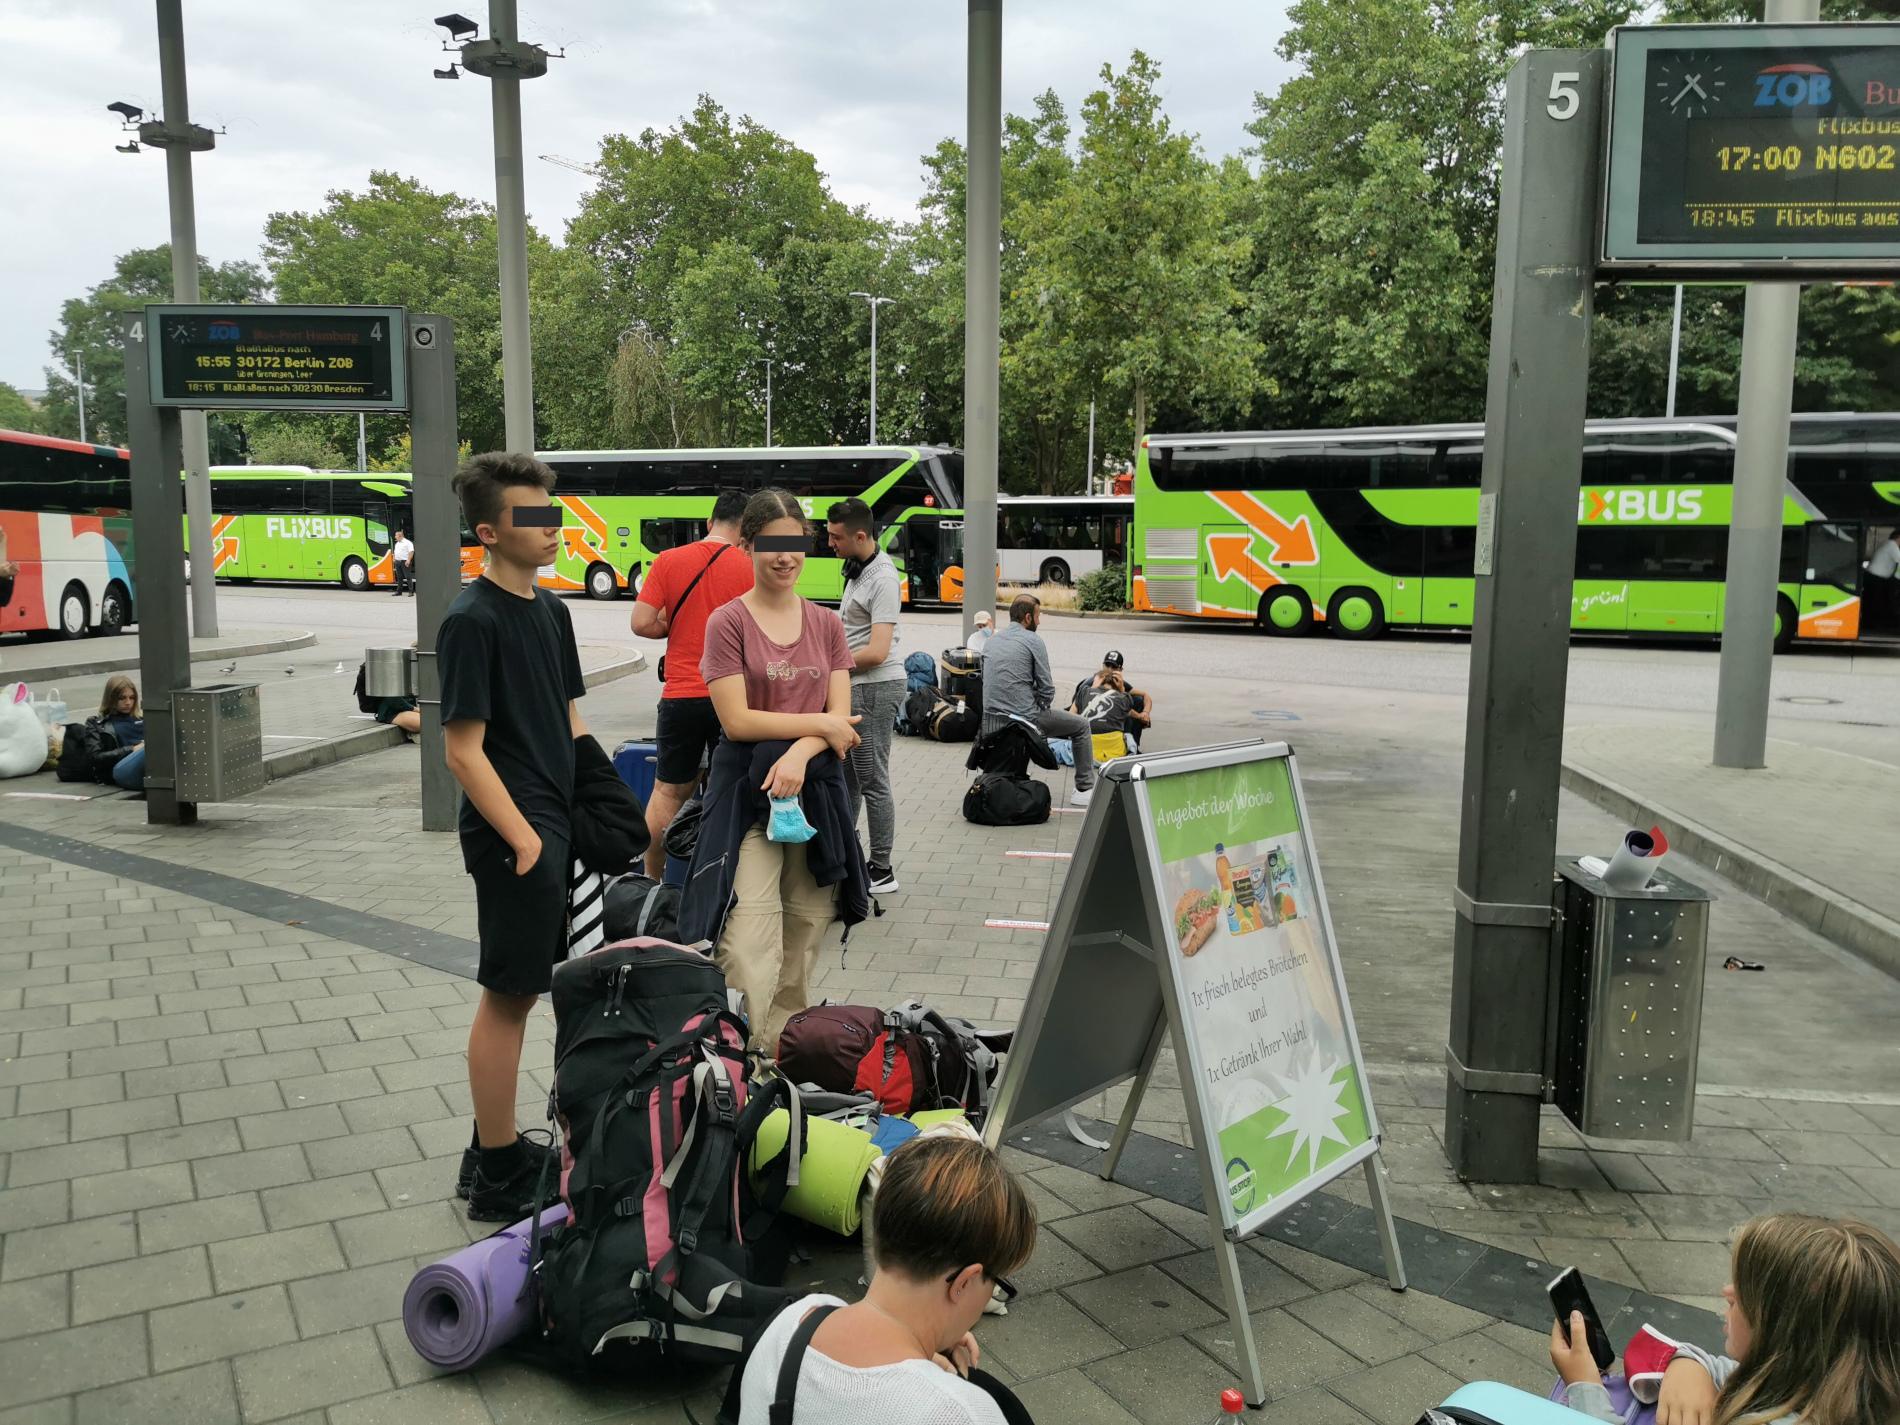 Flixbushaltestelle in Hamburg